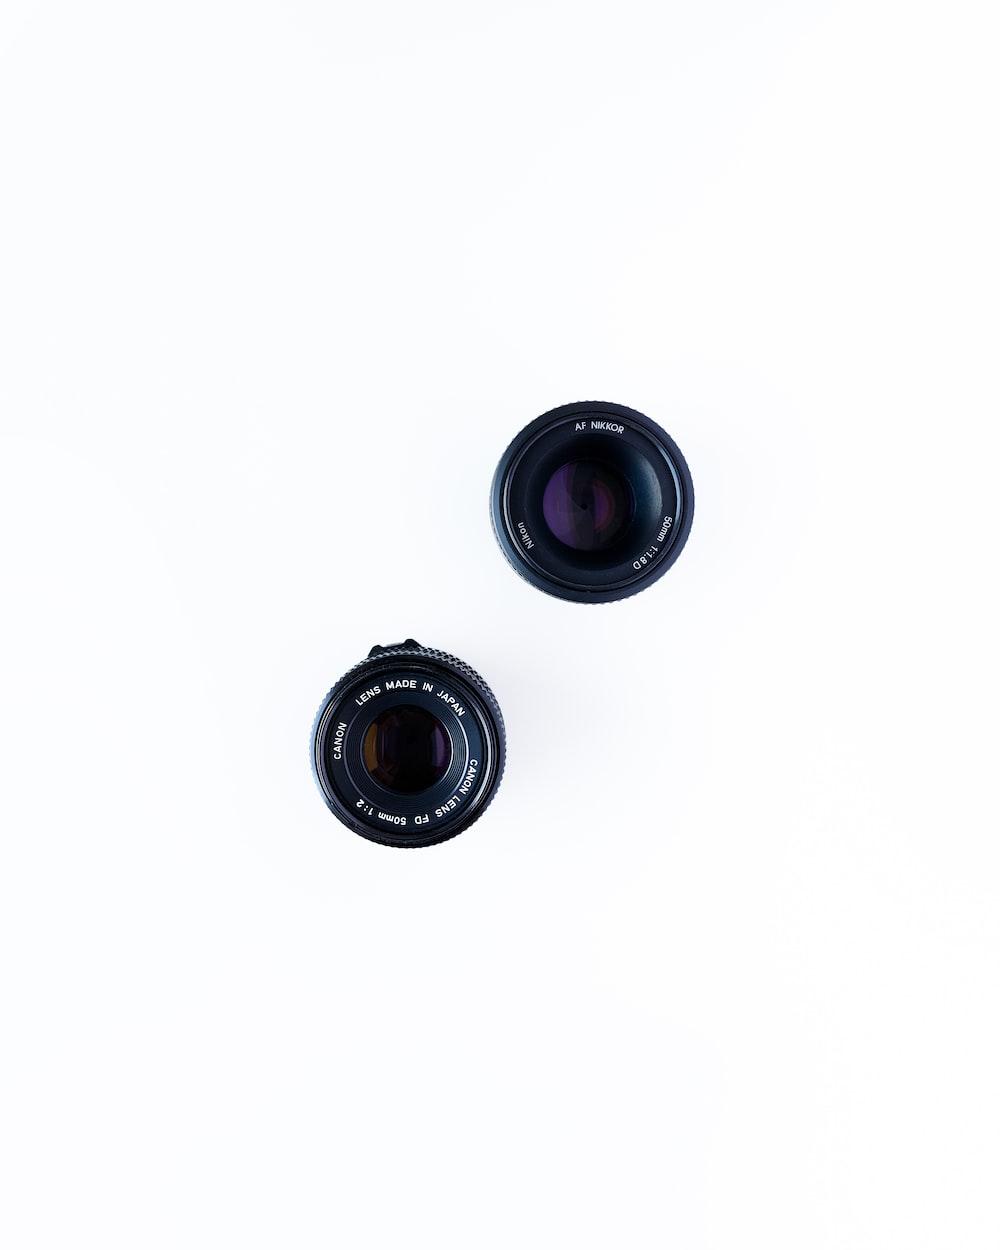 two black camera lenses